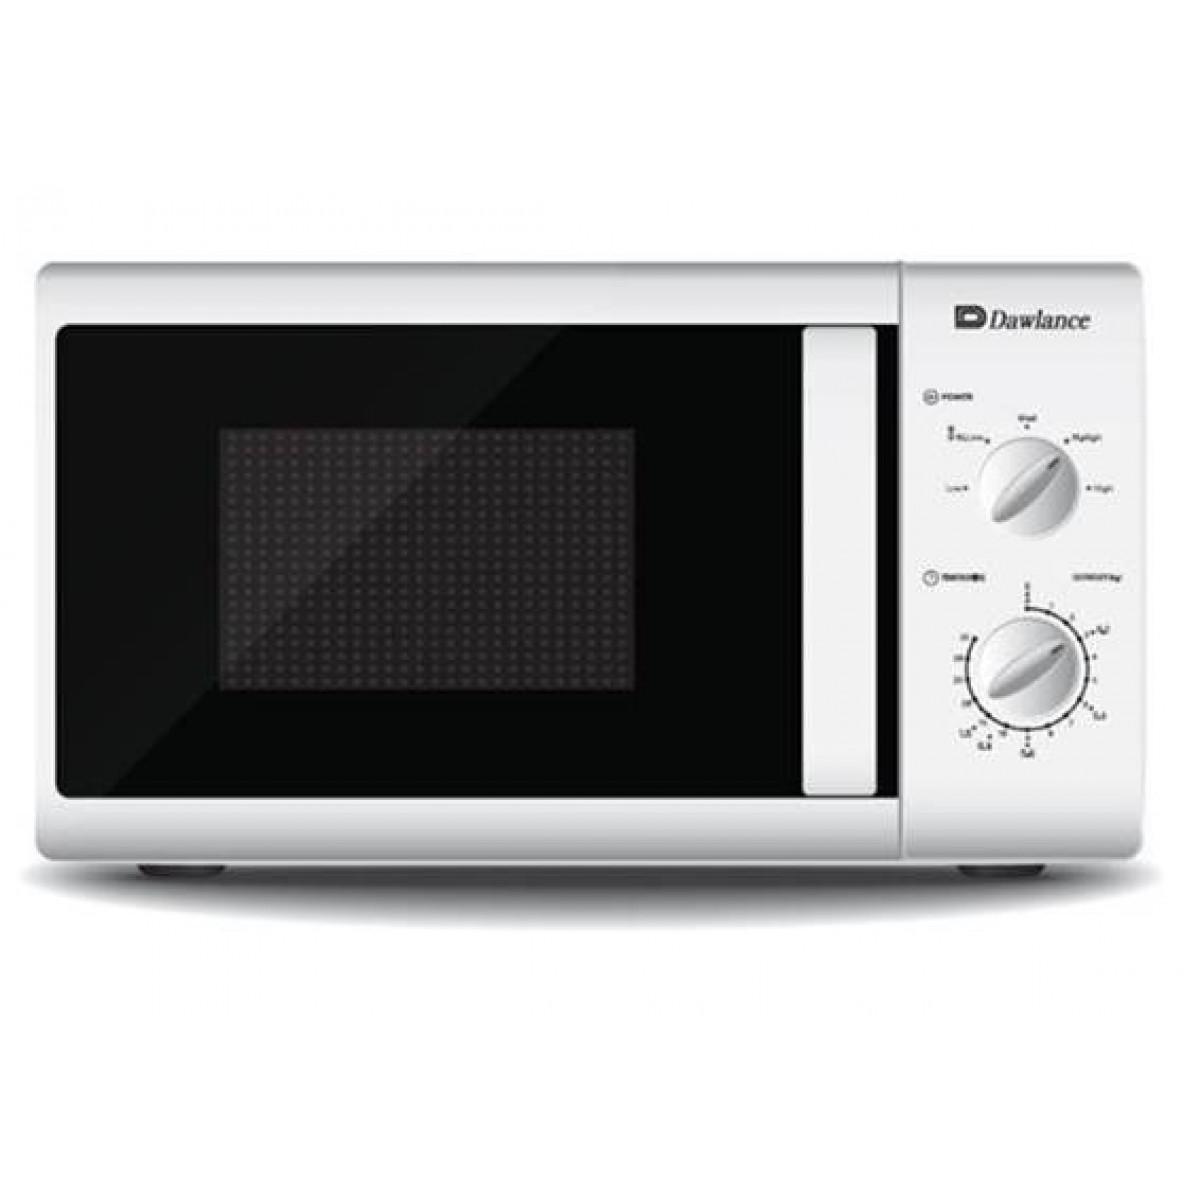 Dawlance DW 210 S Microwave Oven 20 Liter